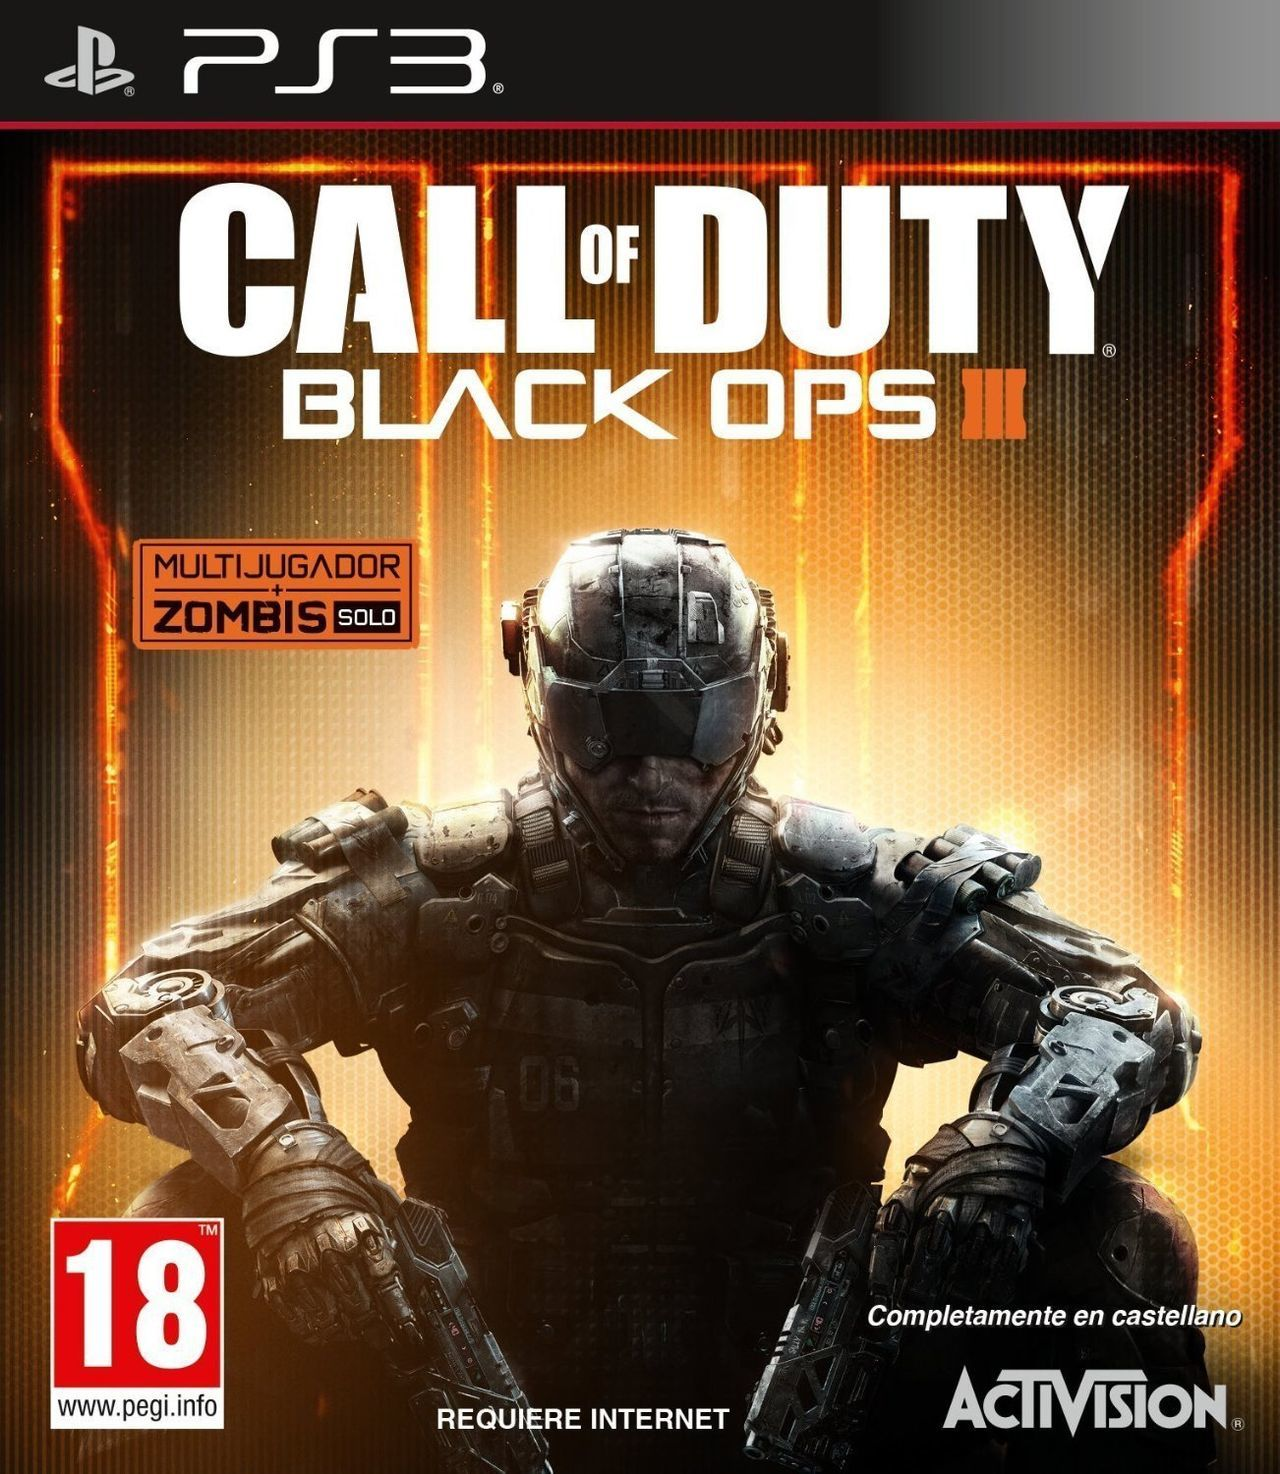 Imagen 32 de Call of Duty: Black Ops III para PlayStation 3